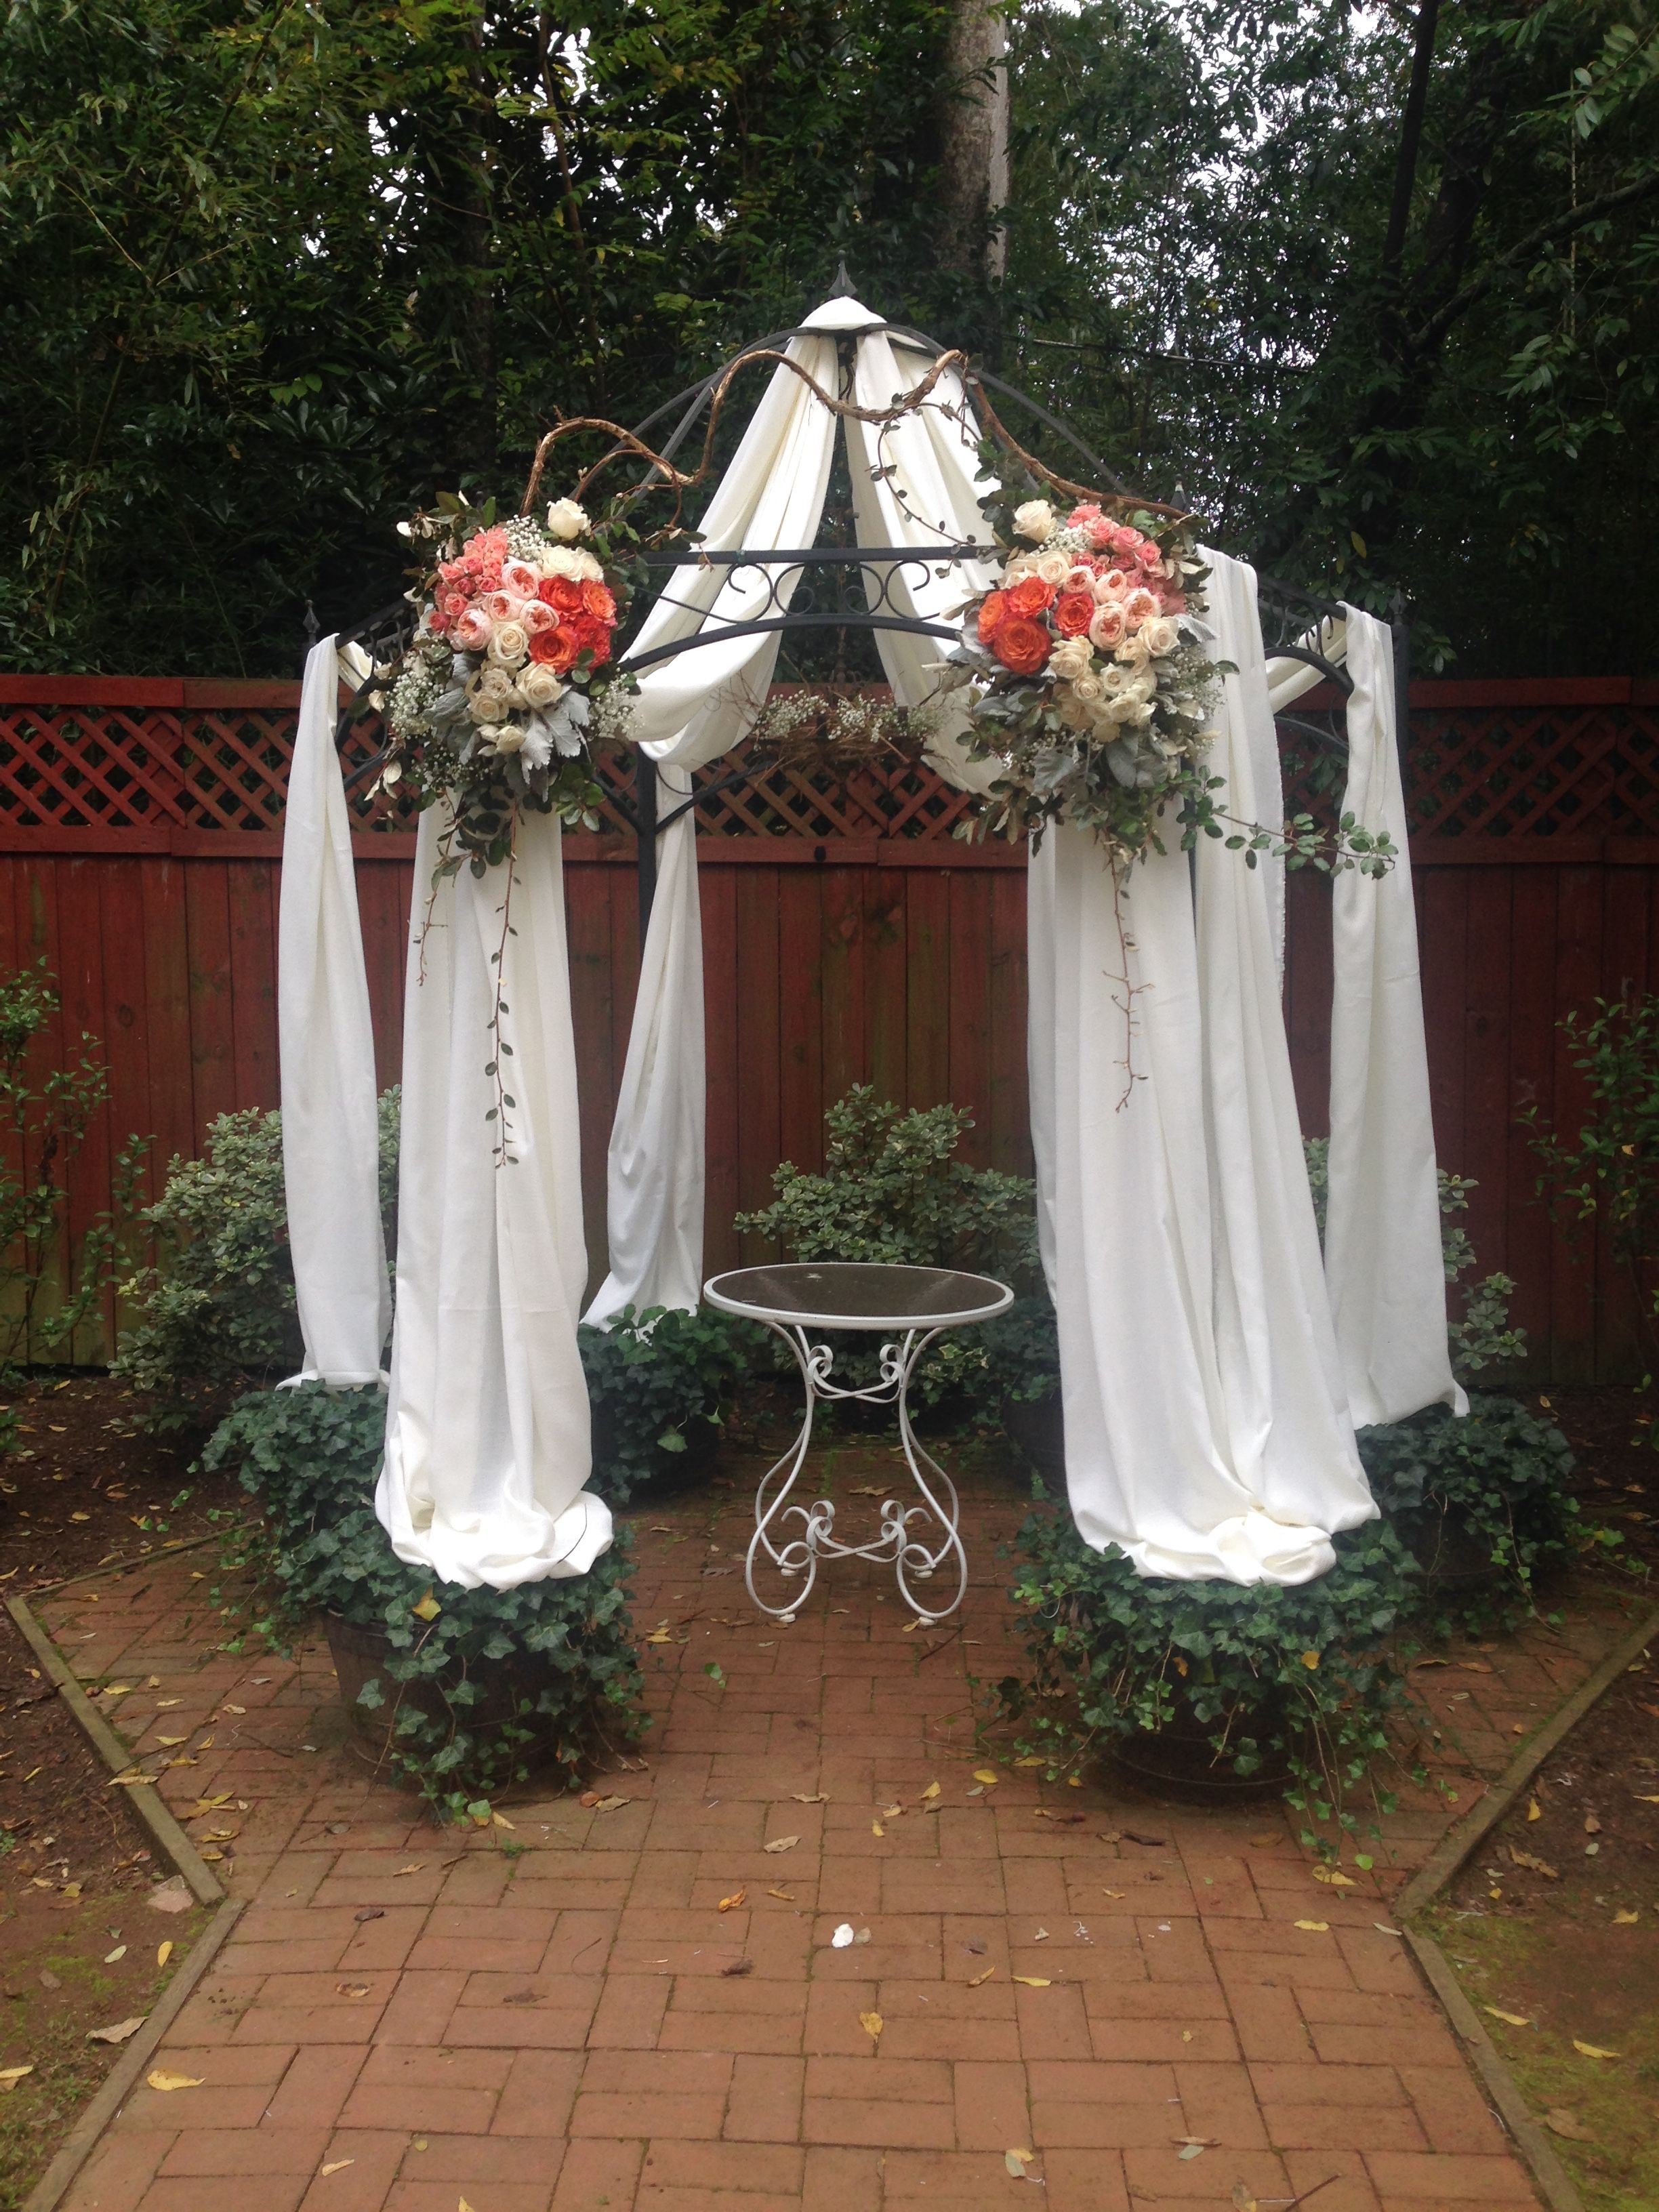 Gazebo Decoration Tulle Duncan Estate Wedding Www Duncanestate Com Gazebo Decorations Gazebo Gazebo Wedding